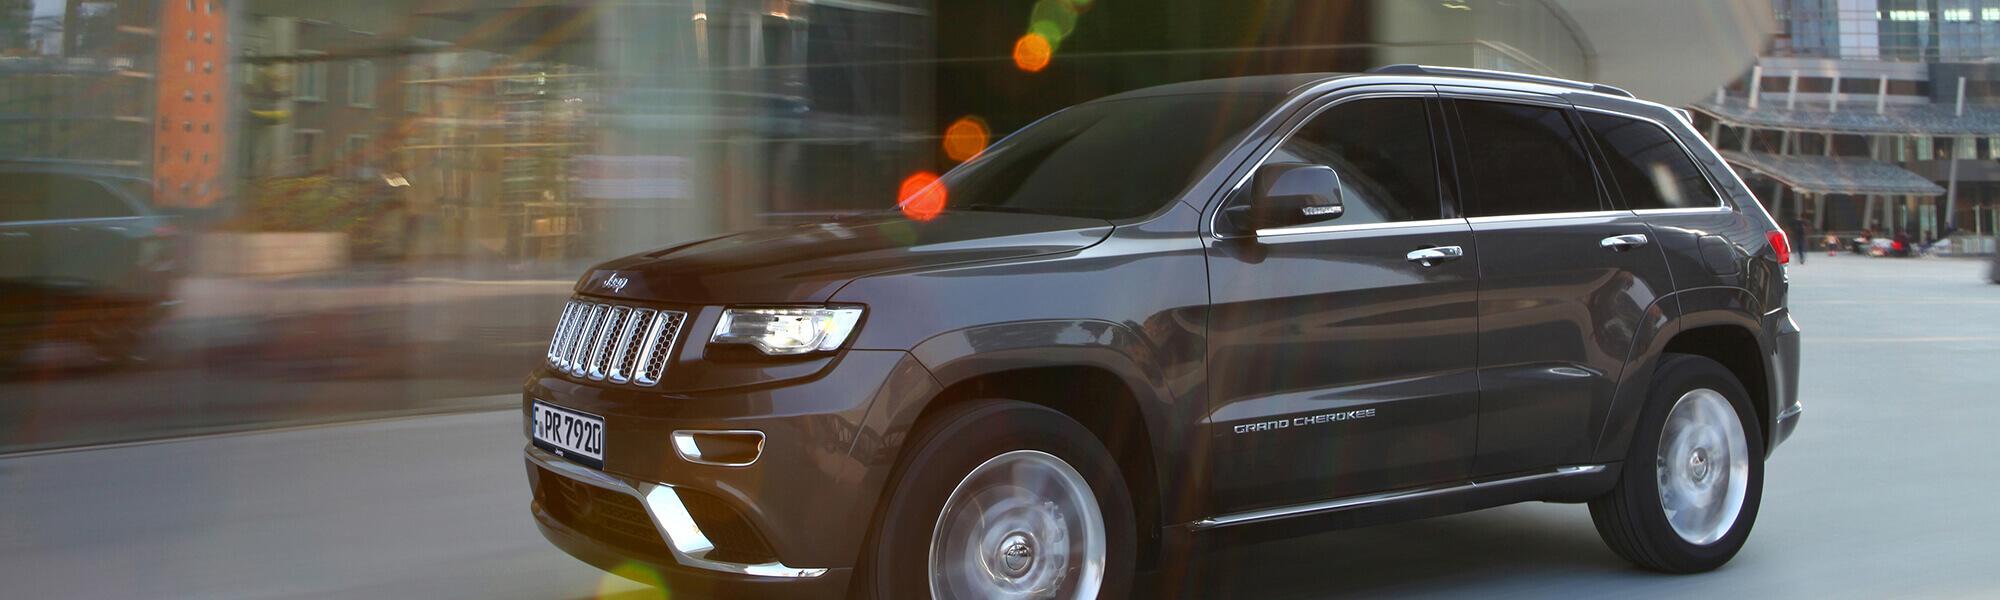 ulmen-jeep-grand-cherokee-slider-3